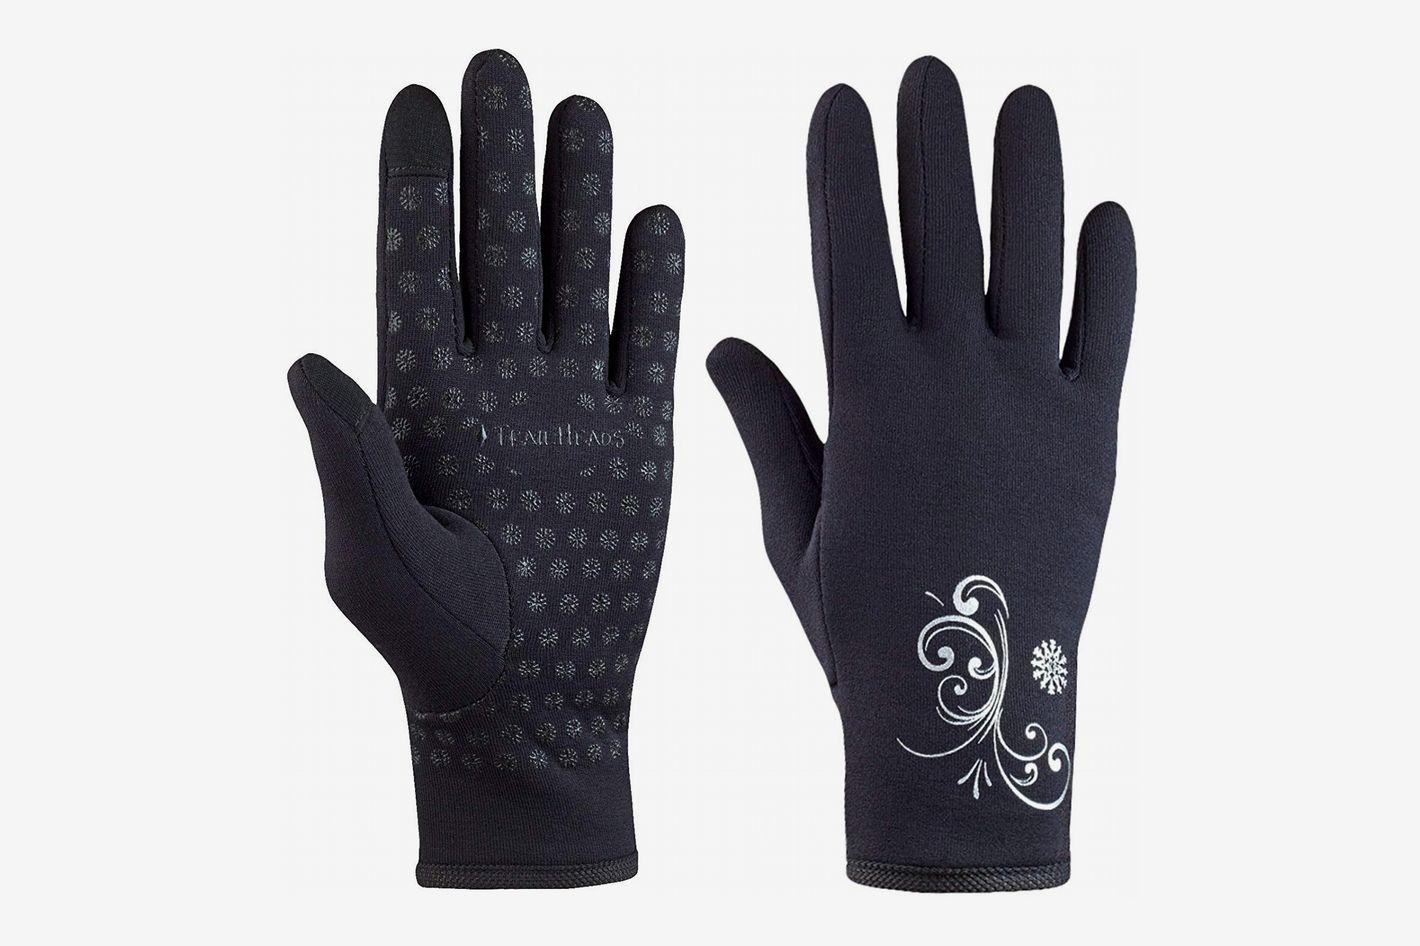 cc50689a4 11 Best Touchscreen Gloves for Men and Women